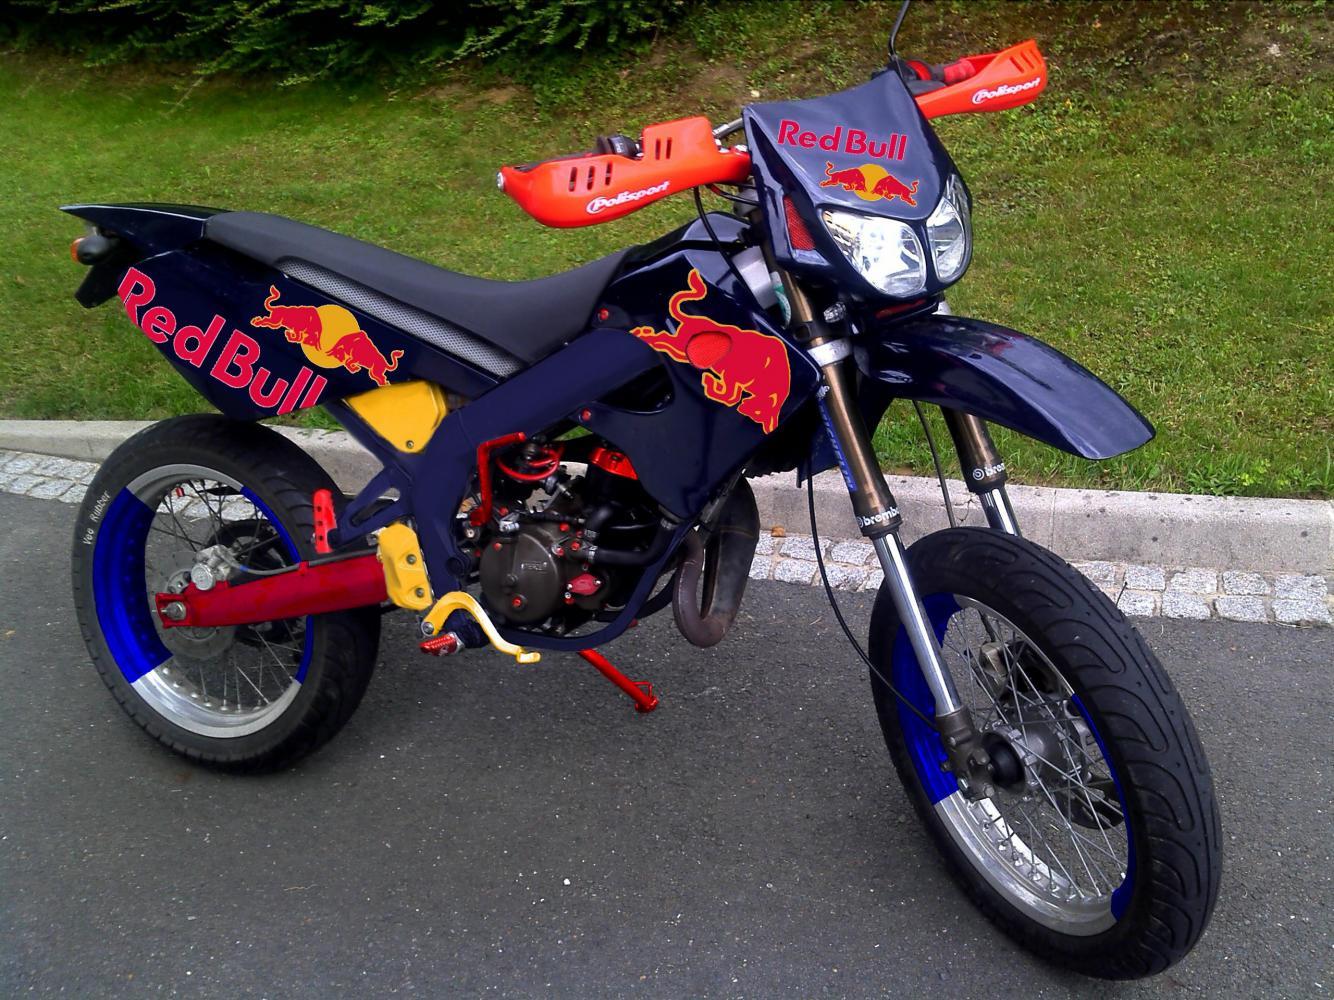 Red Bull Fakes 2stroke Tuning